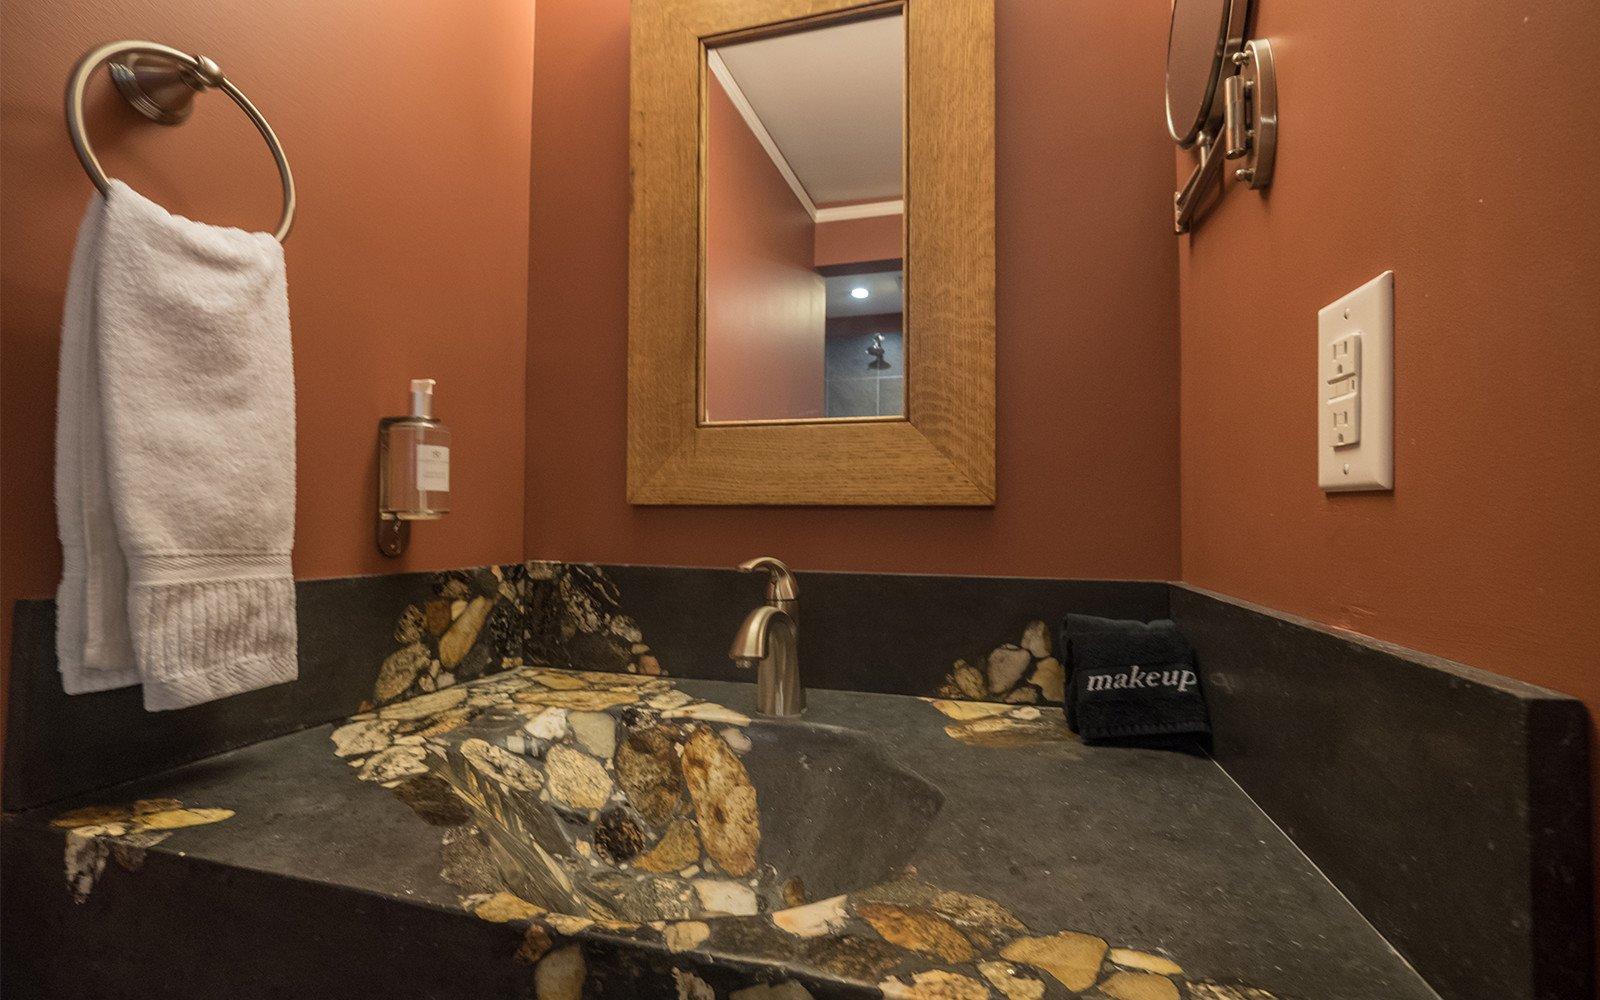 Braxton-custom-concrete-and-river-rock-sink